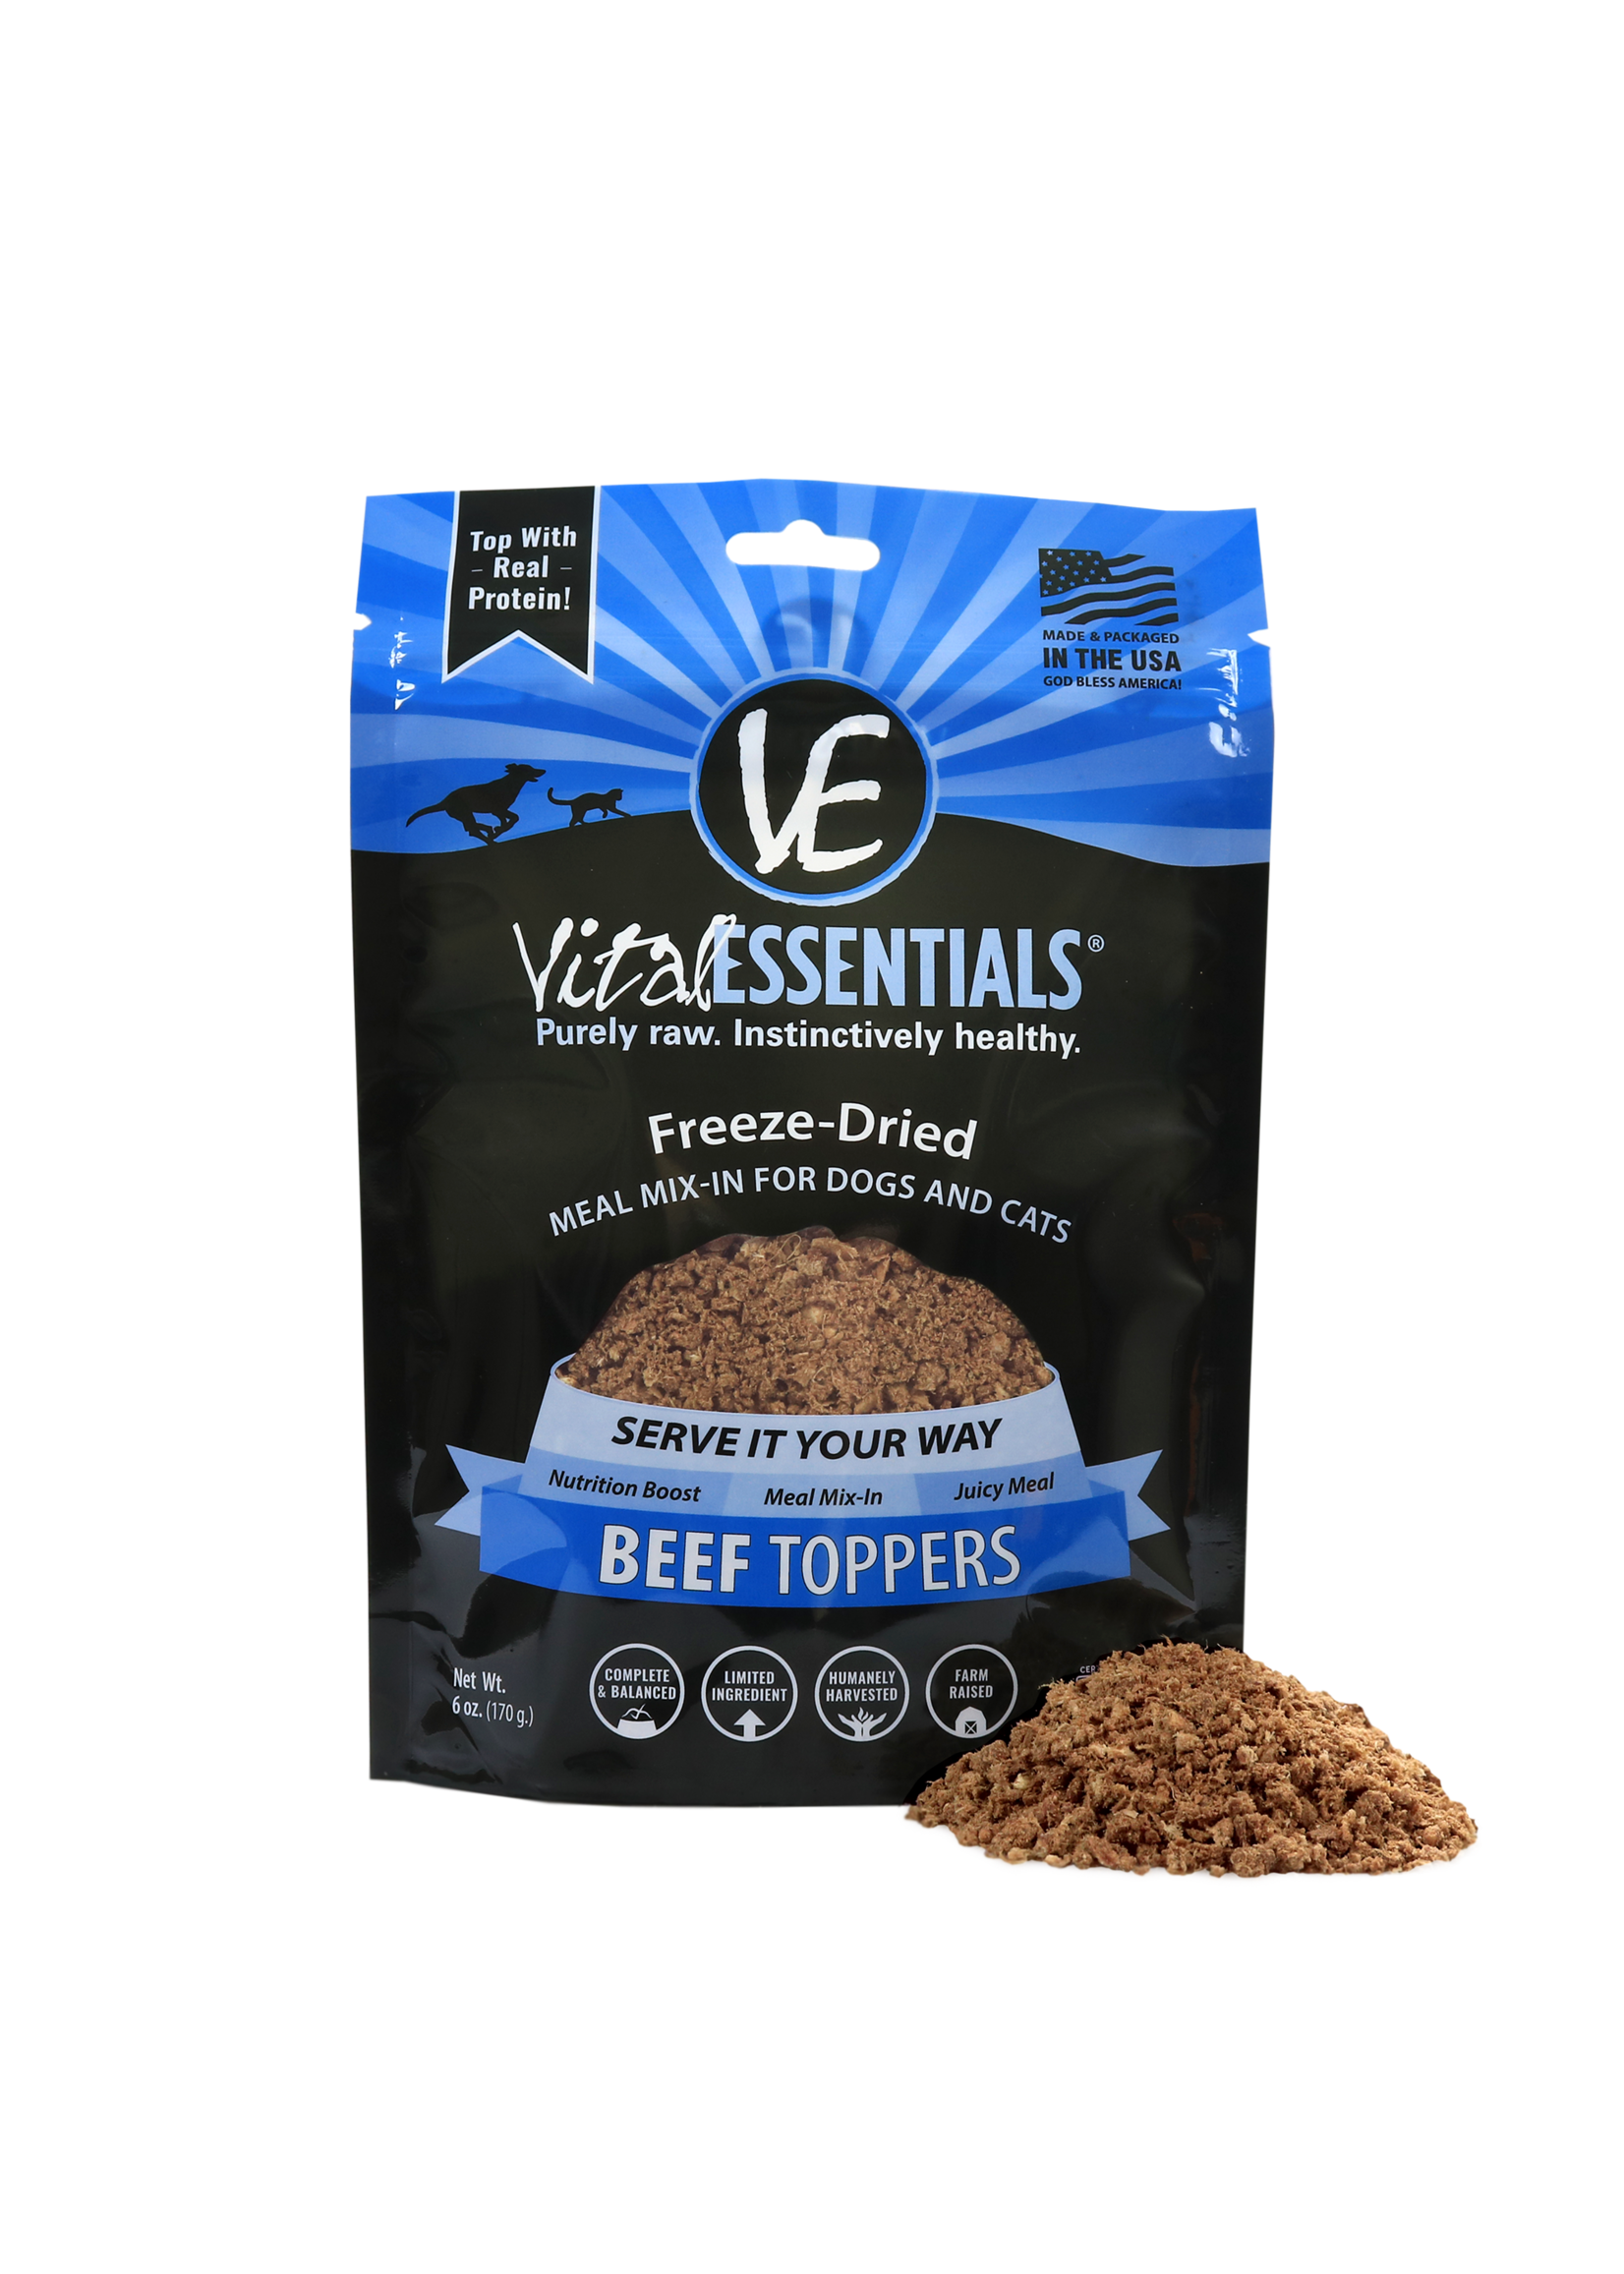 Vital Essentials Vital Essentials FD Topper Beef 6 oz